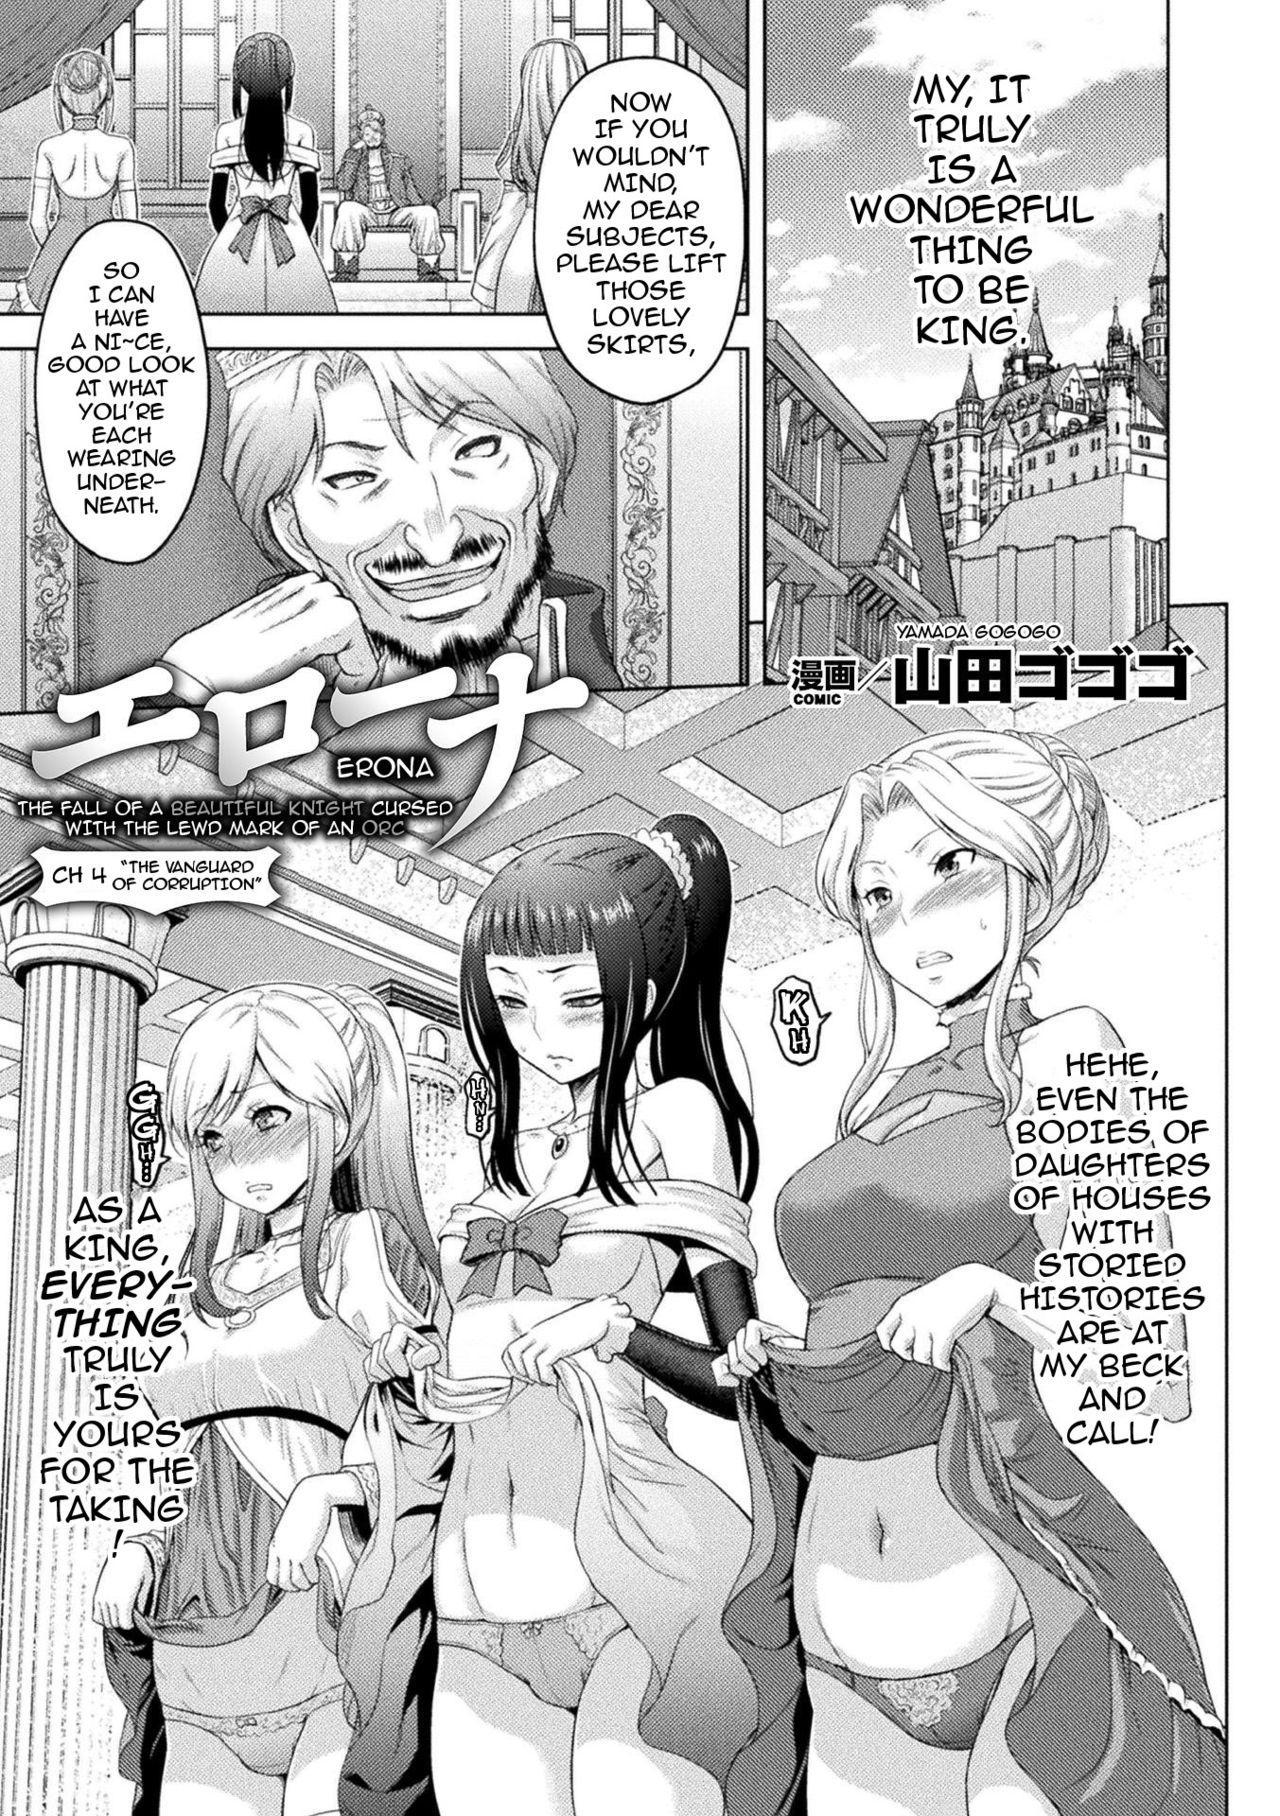 [Yamada Gogogo] Erona ~Orc no Inmon ni Okasareta Onna Kishi no Matsuro~ | Erona ~The Fall of a Beautiful Knight Cursed with the Lewd Mark of an Orc~ Ch. 1-5 [English] {darknight} 75